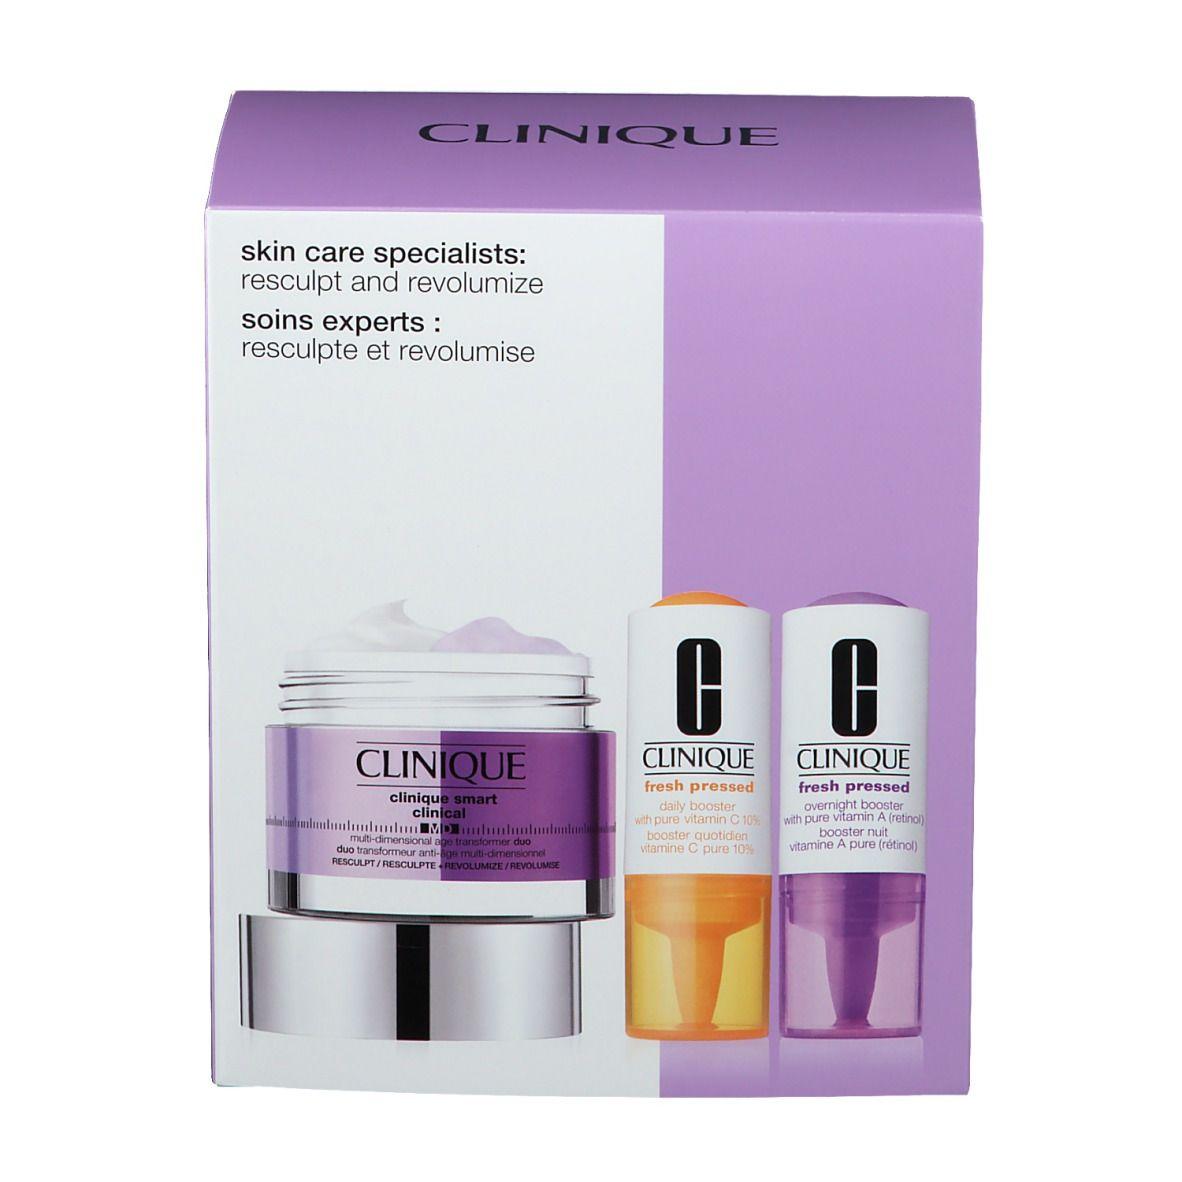 CLINIQUE Skin Care Specialists: Resculpt and Revolumize